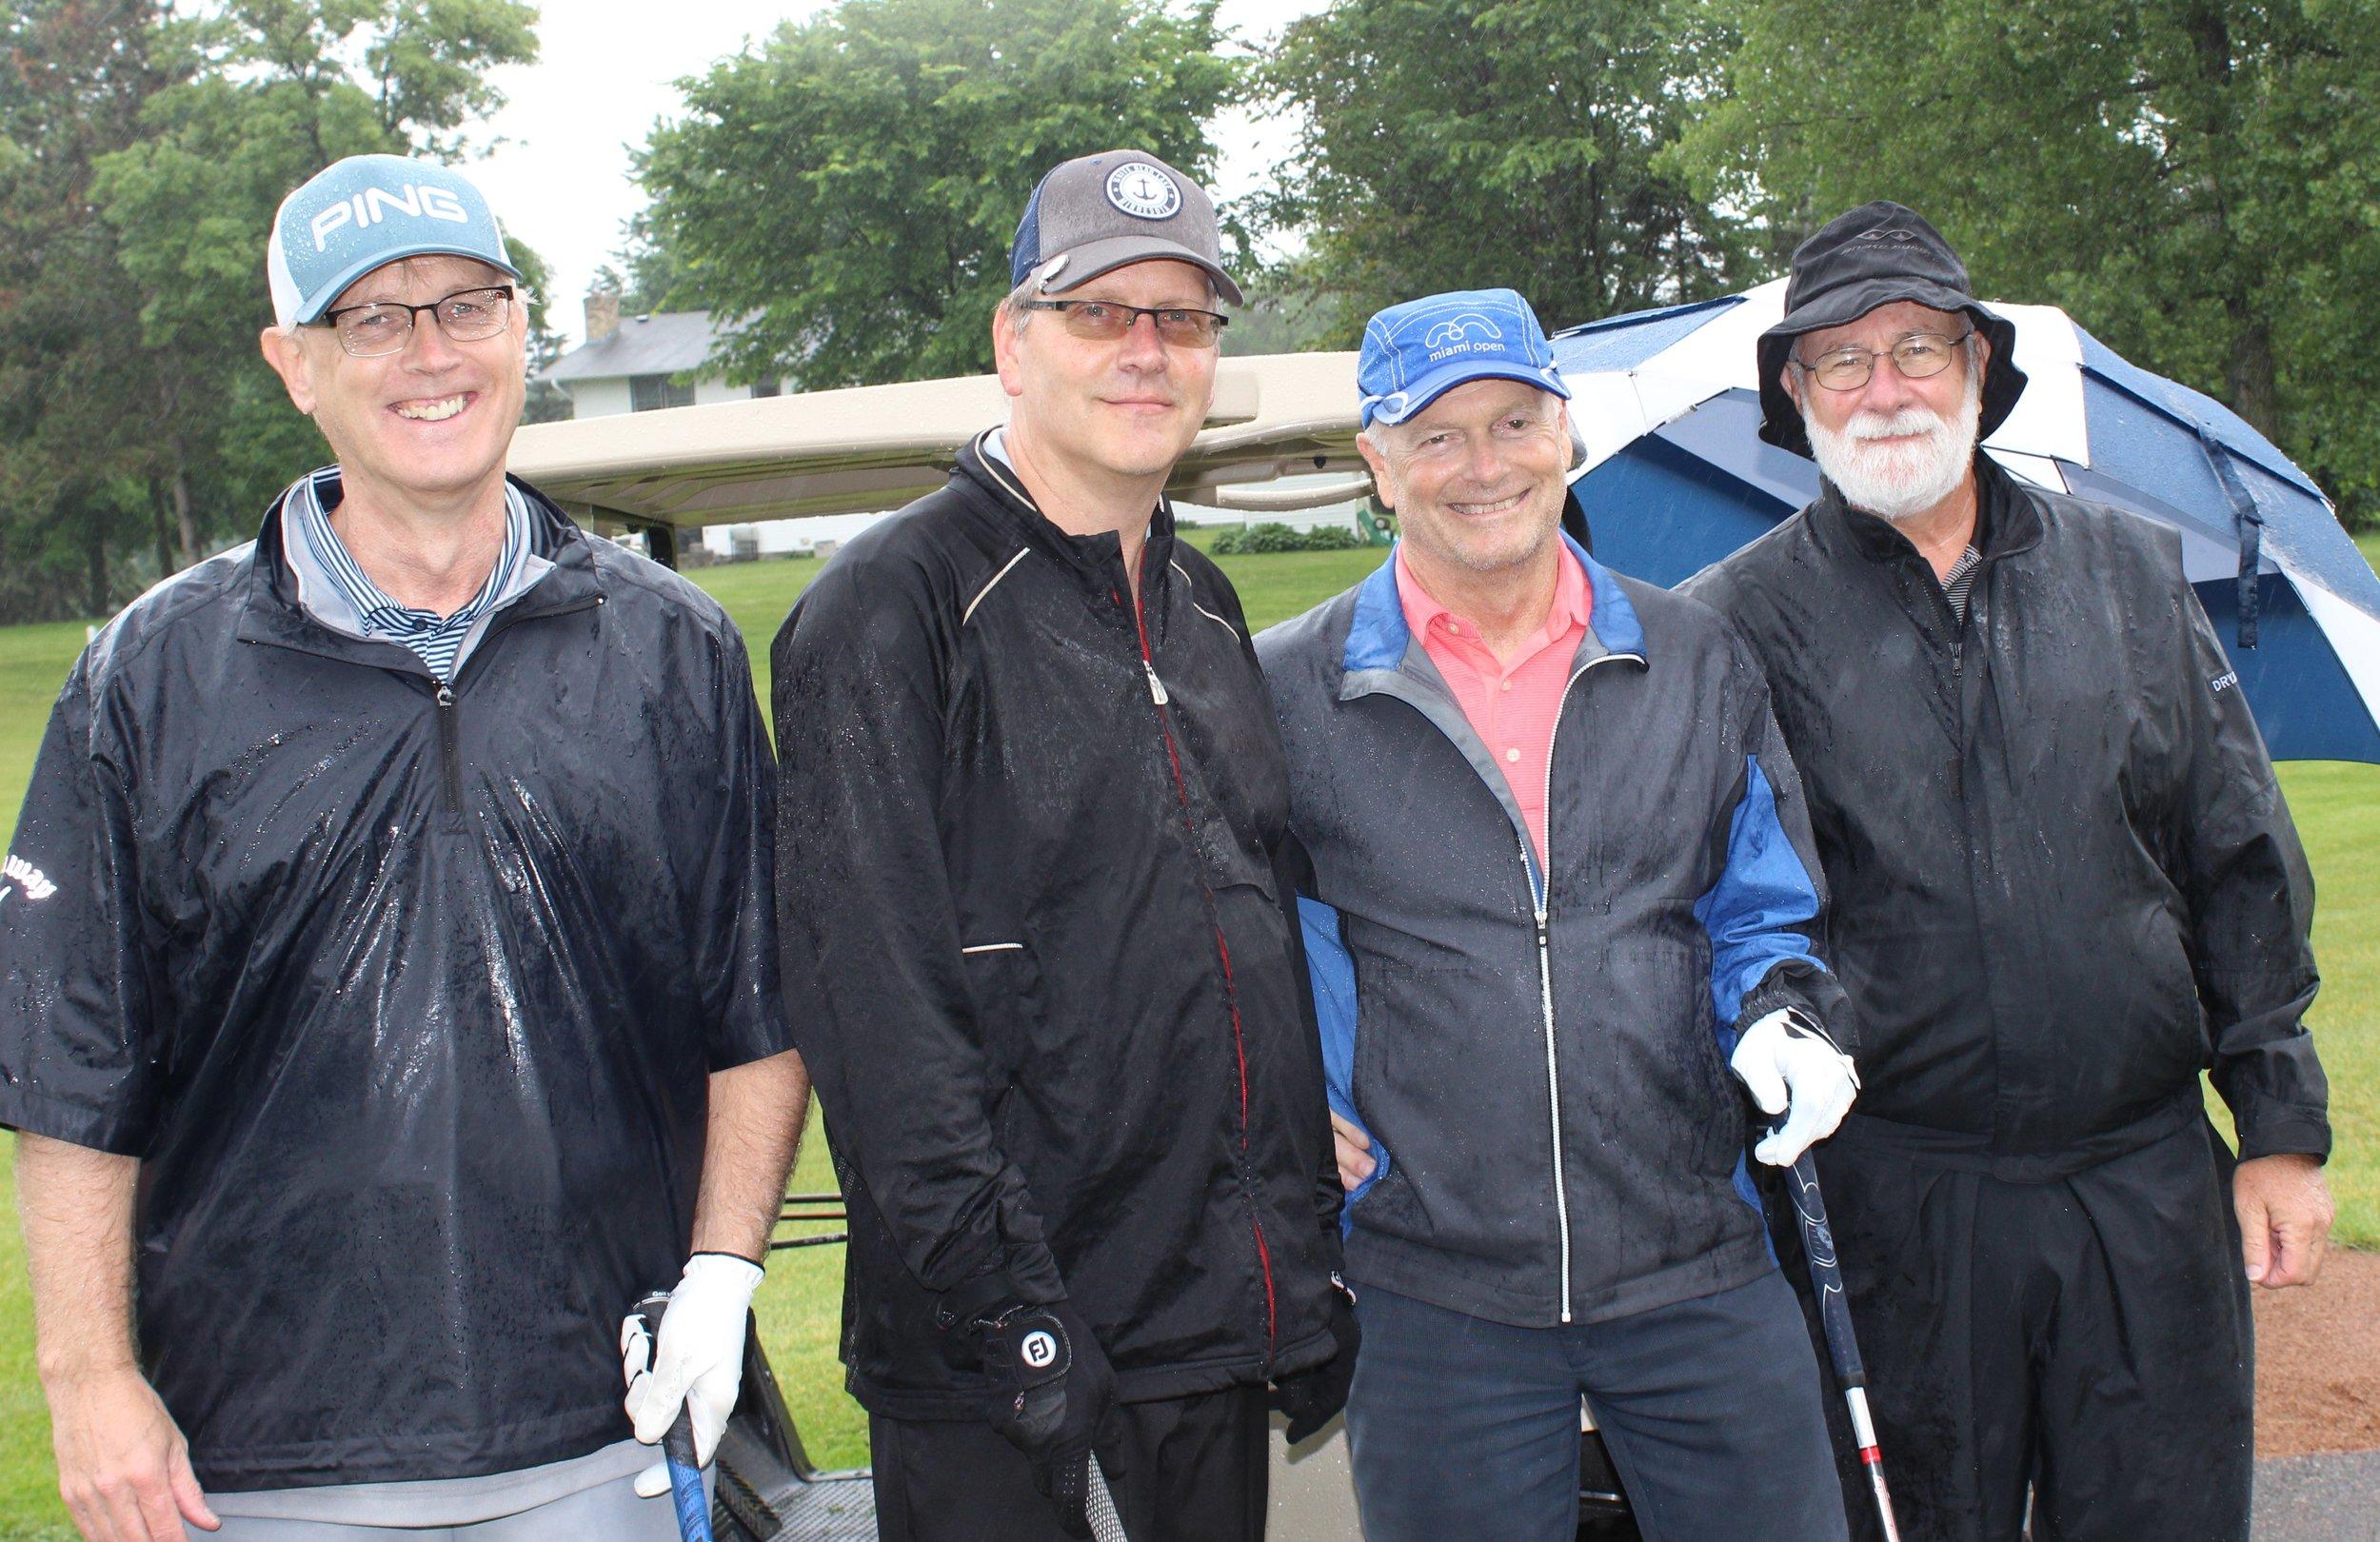 6B Boyum Barenscheer - Dave Potts, Scott Boyd, Pete Hogerton, Arnie Nelson.jpg